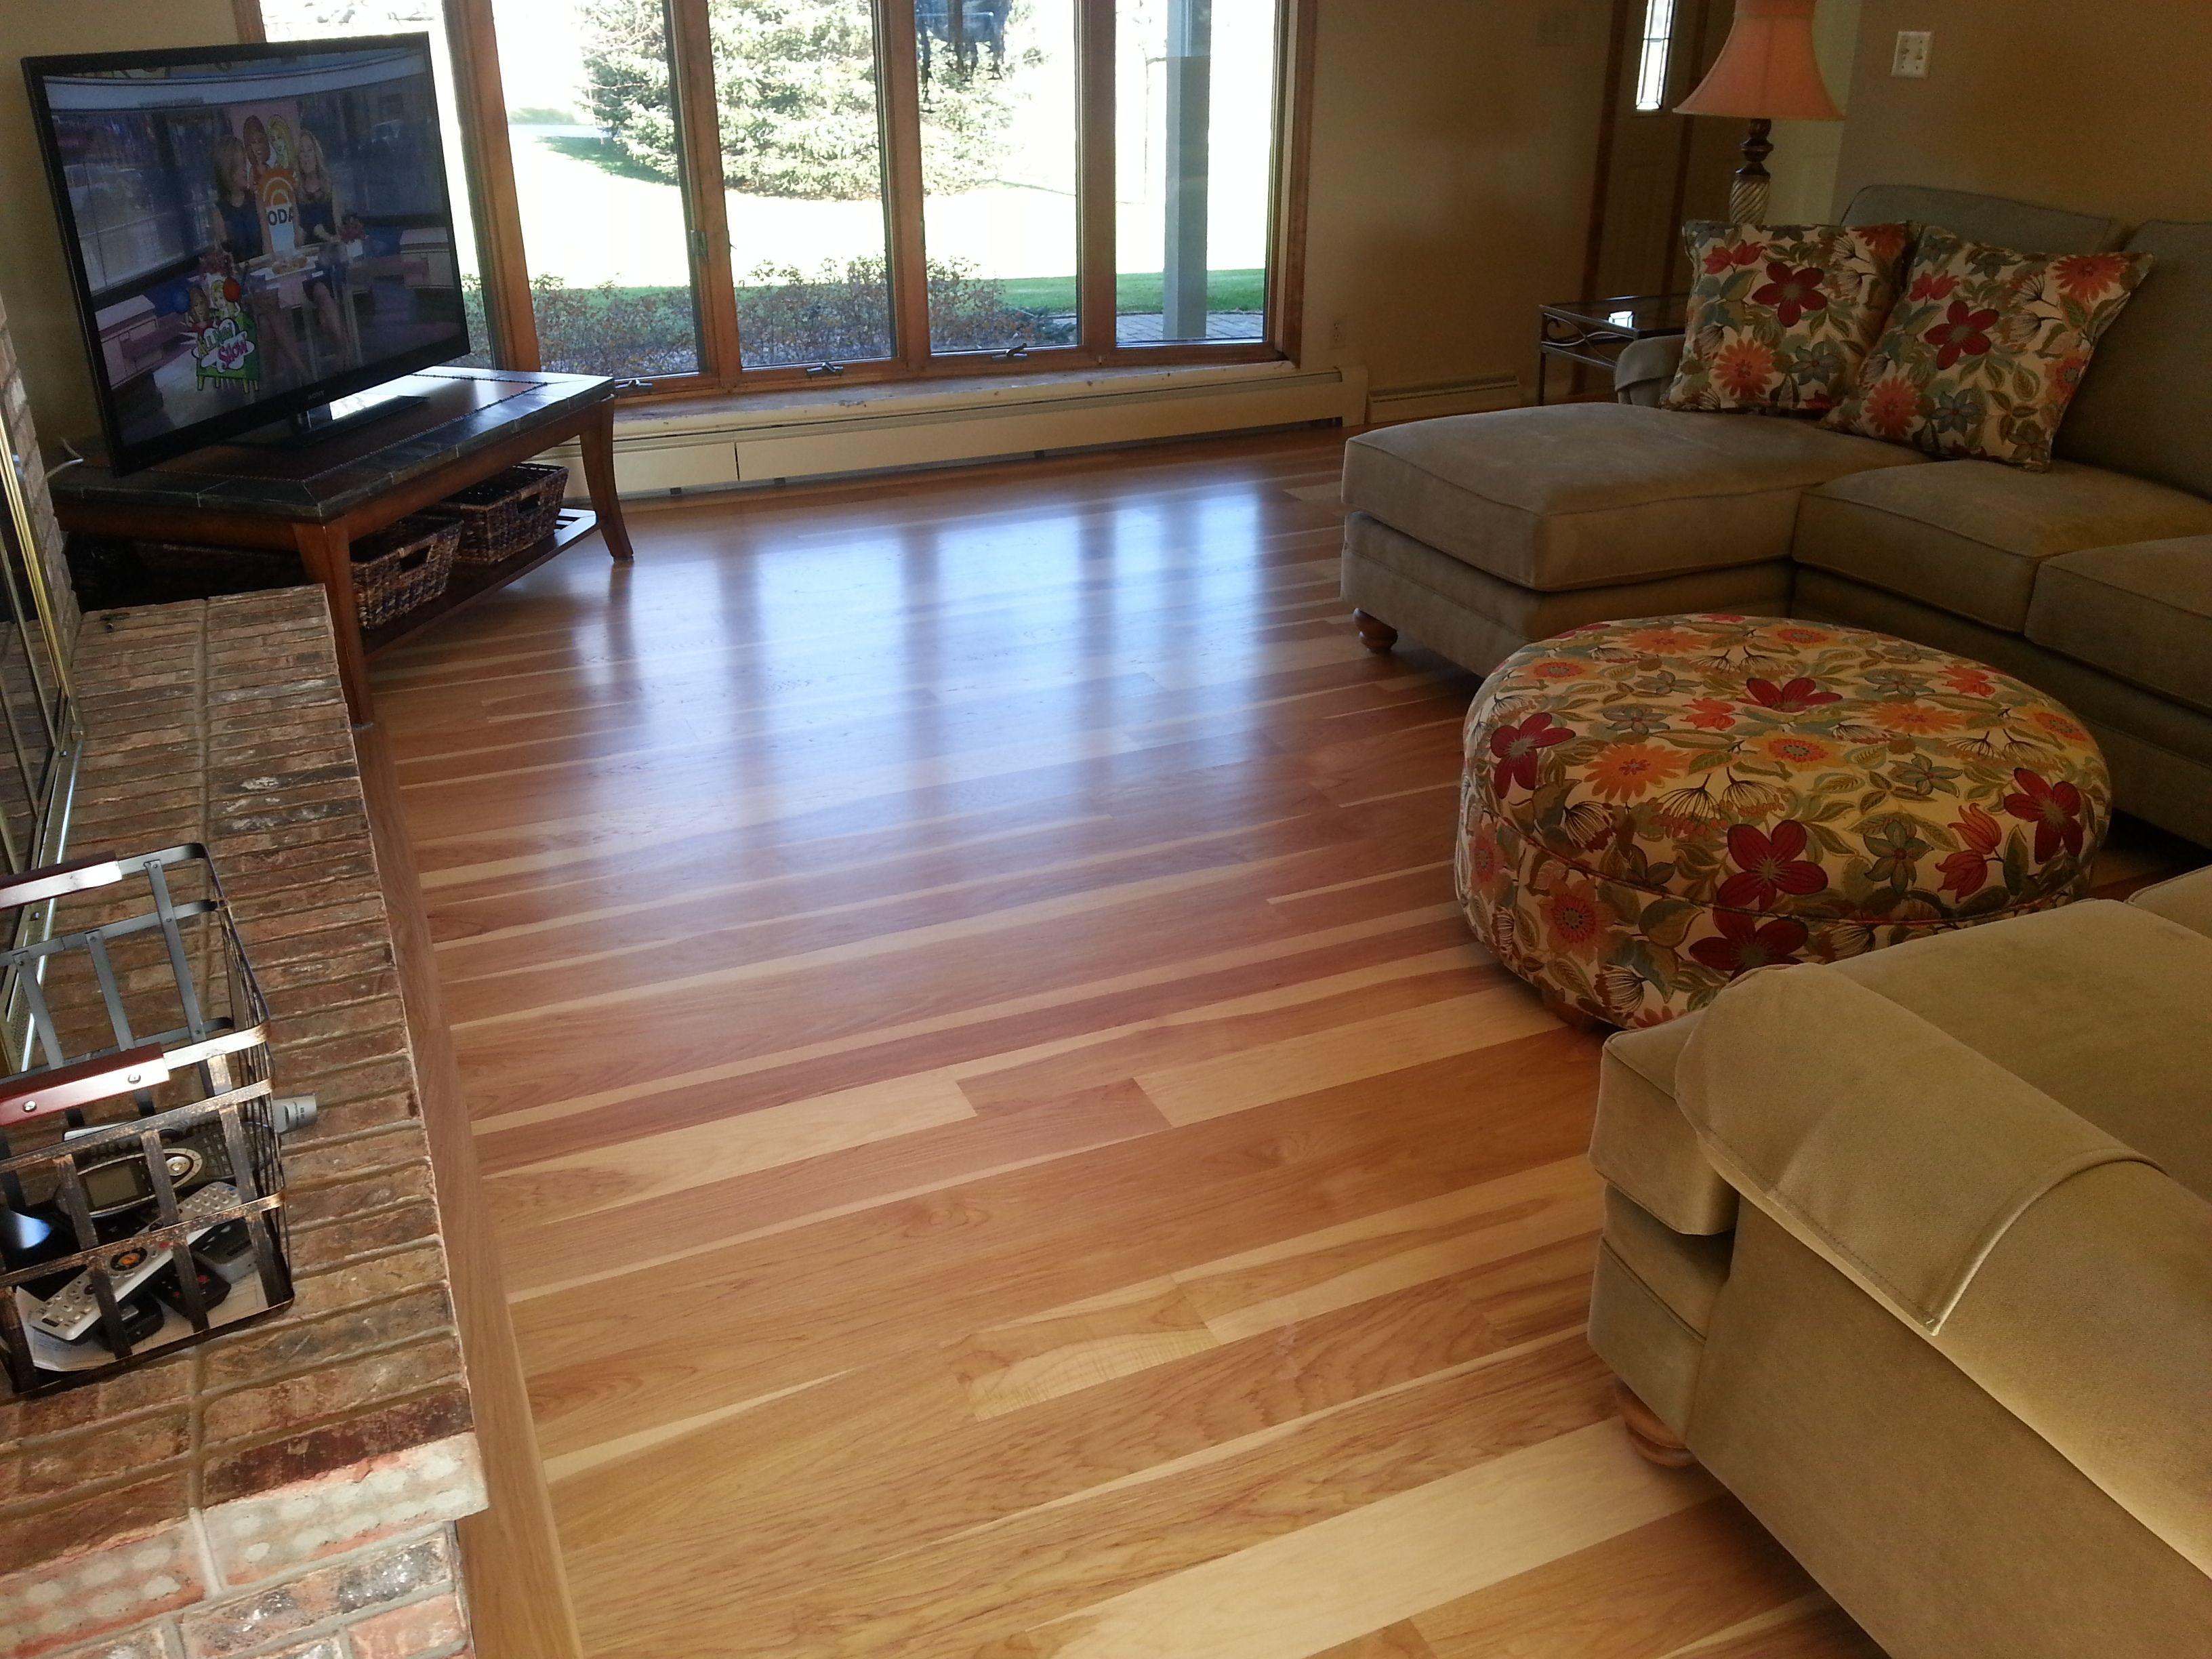 inexpensive hardwood flooring of 40 how to start laminate flooring images for custom hickory wide plank hardwood floor miwlaukee wi